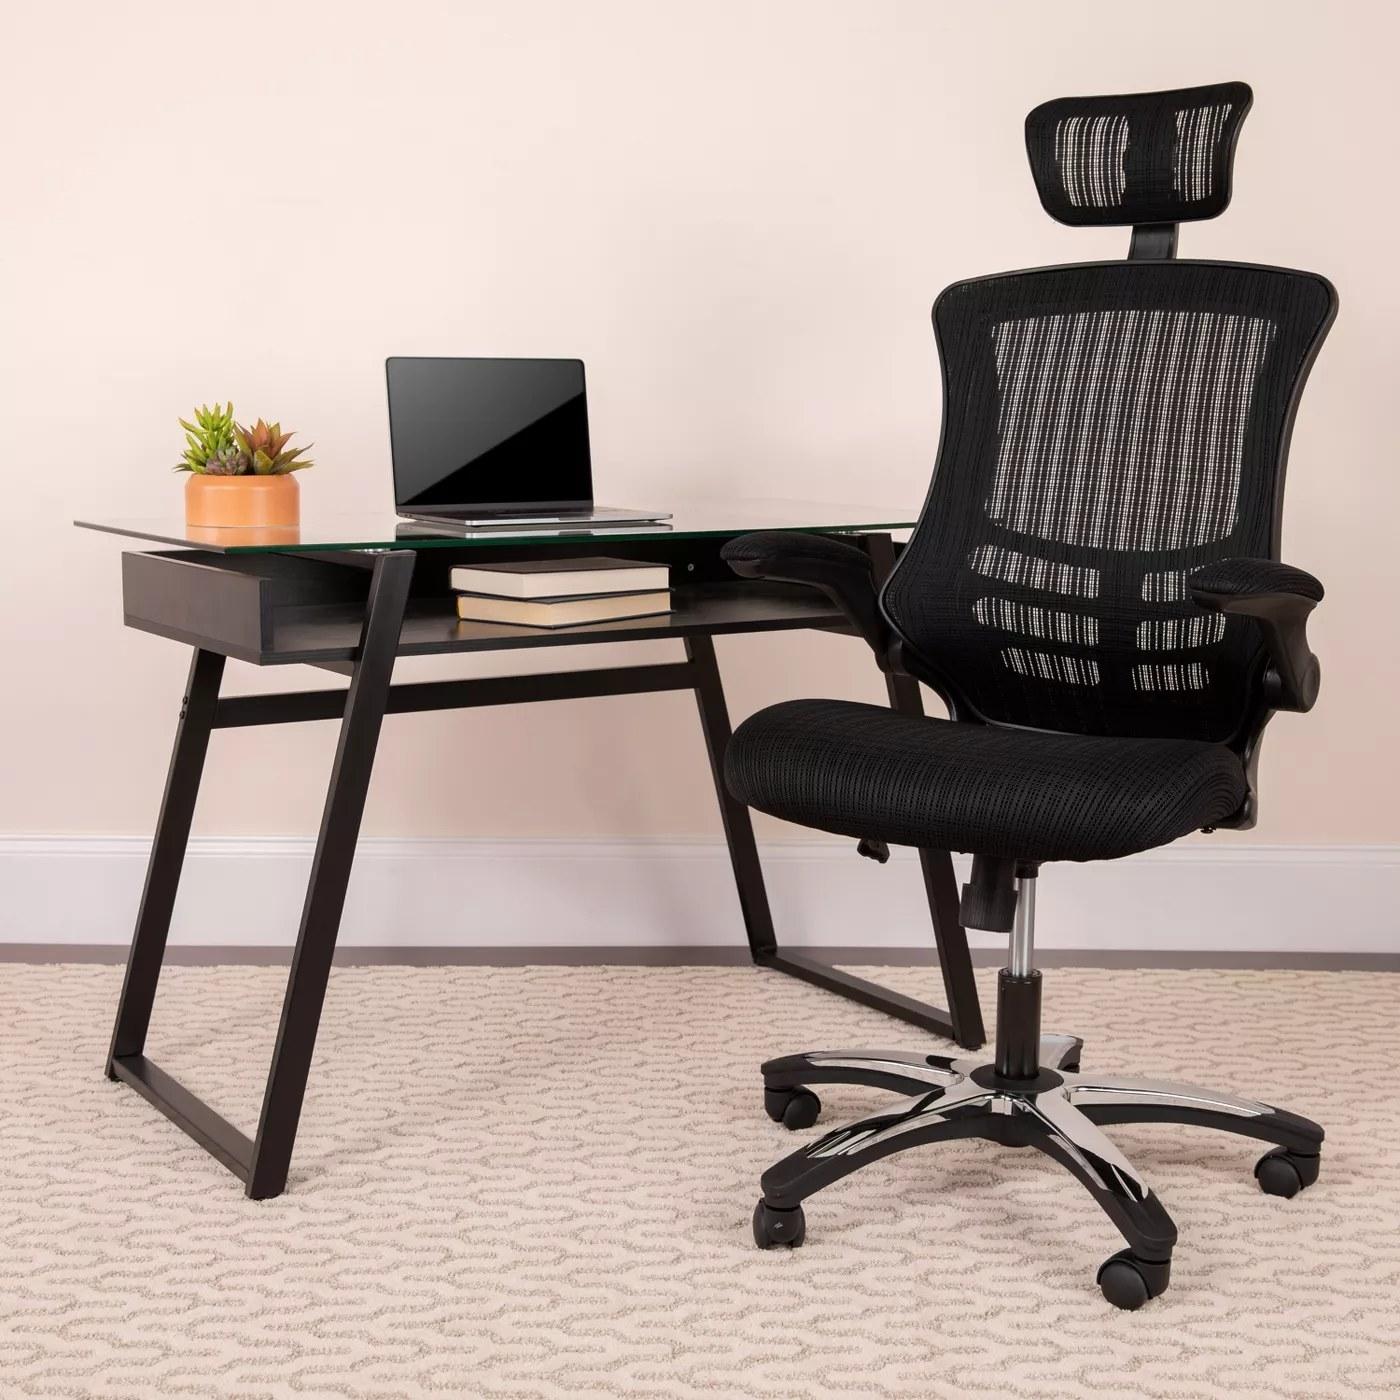 Black mesh high-back desk chair on wheels